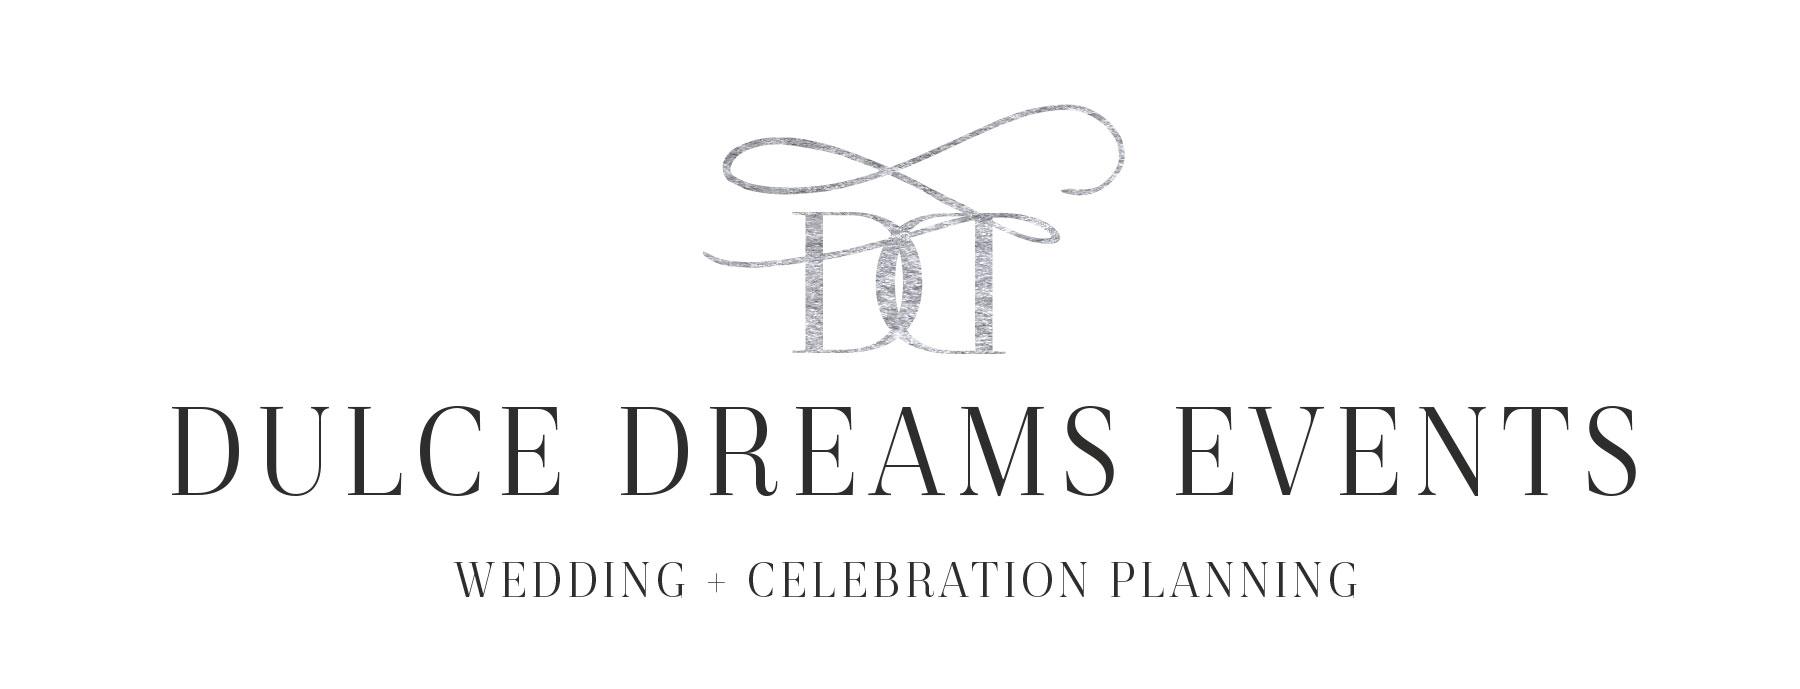 Dulce-Dreams-Events-Alternate-Logo-2-72dpi-PNG (1).jpg